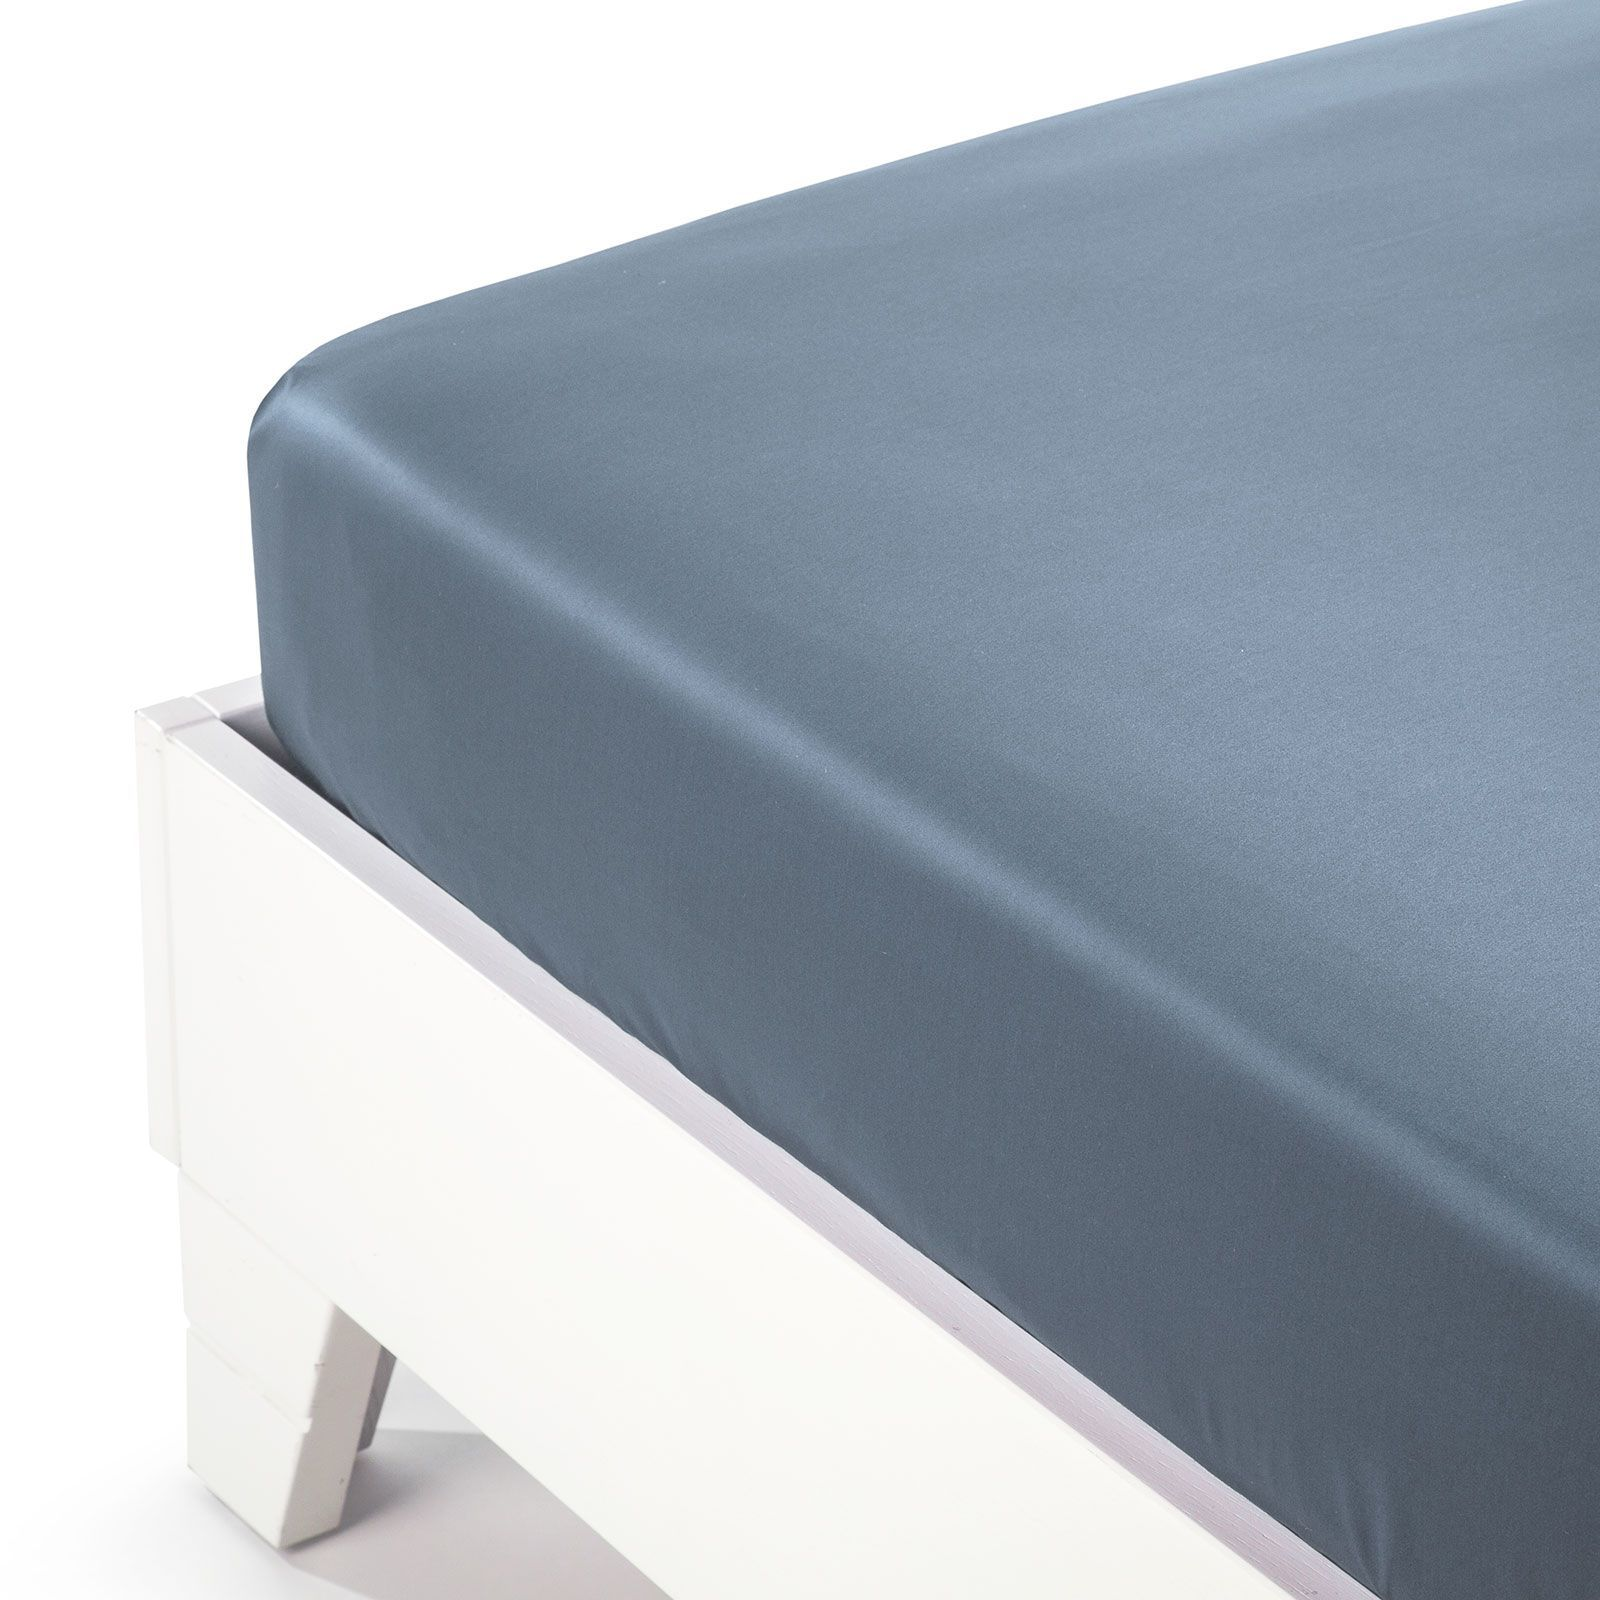 На резинке Простыня на резинке 160x200 Сaleffi Raso Tinta Unito с бордюром сатин синяя prostynya-na-rezinke-160x200-saleffi-raso-tinta-unito-s-bordyurom-satin-avio-italiya.jpg